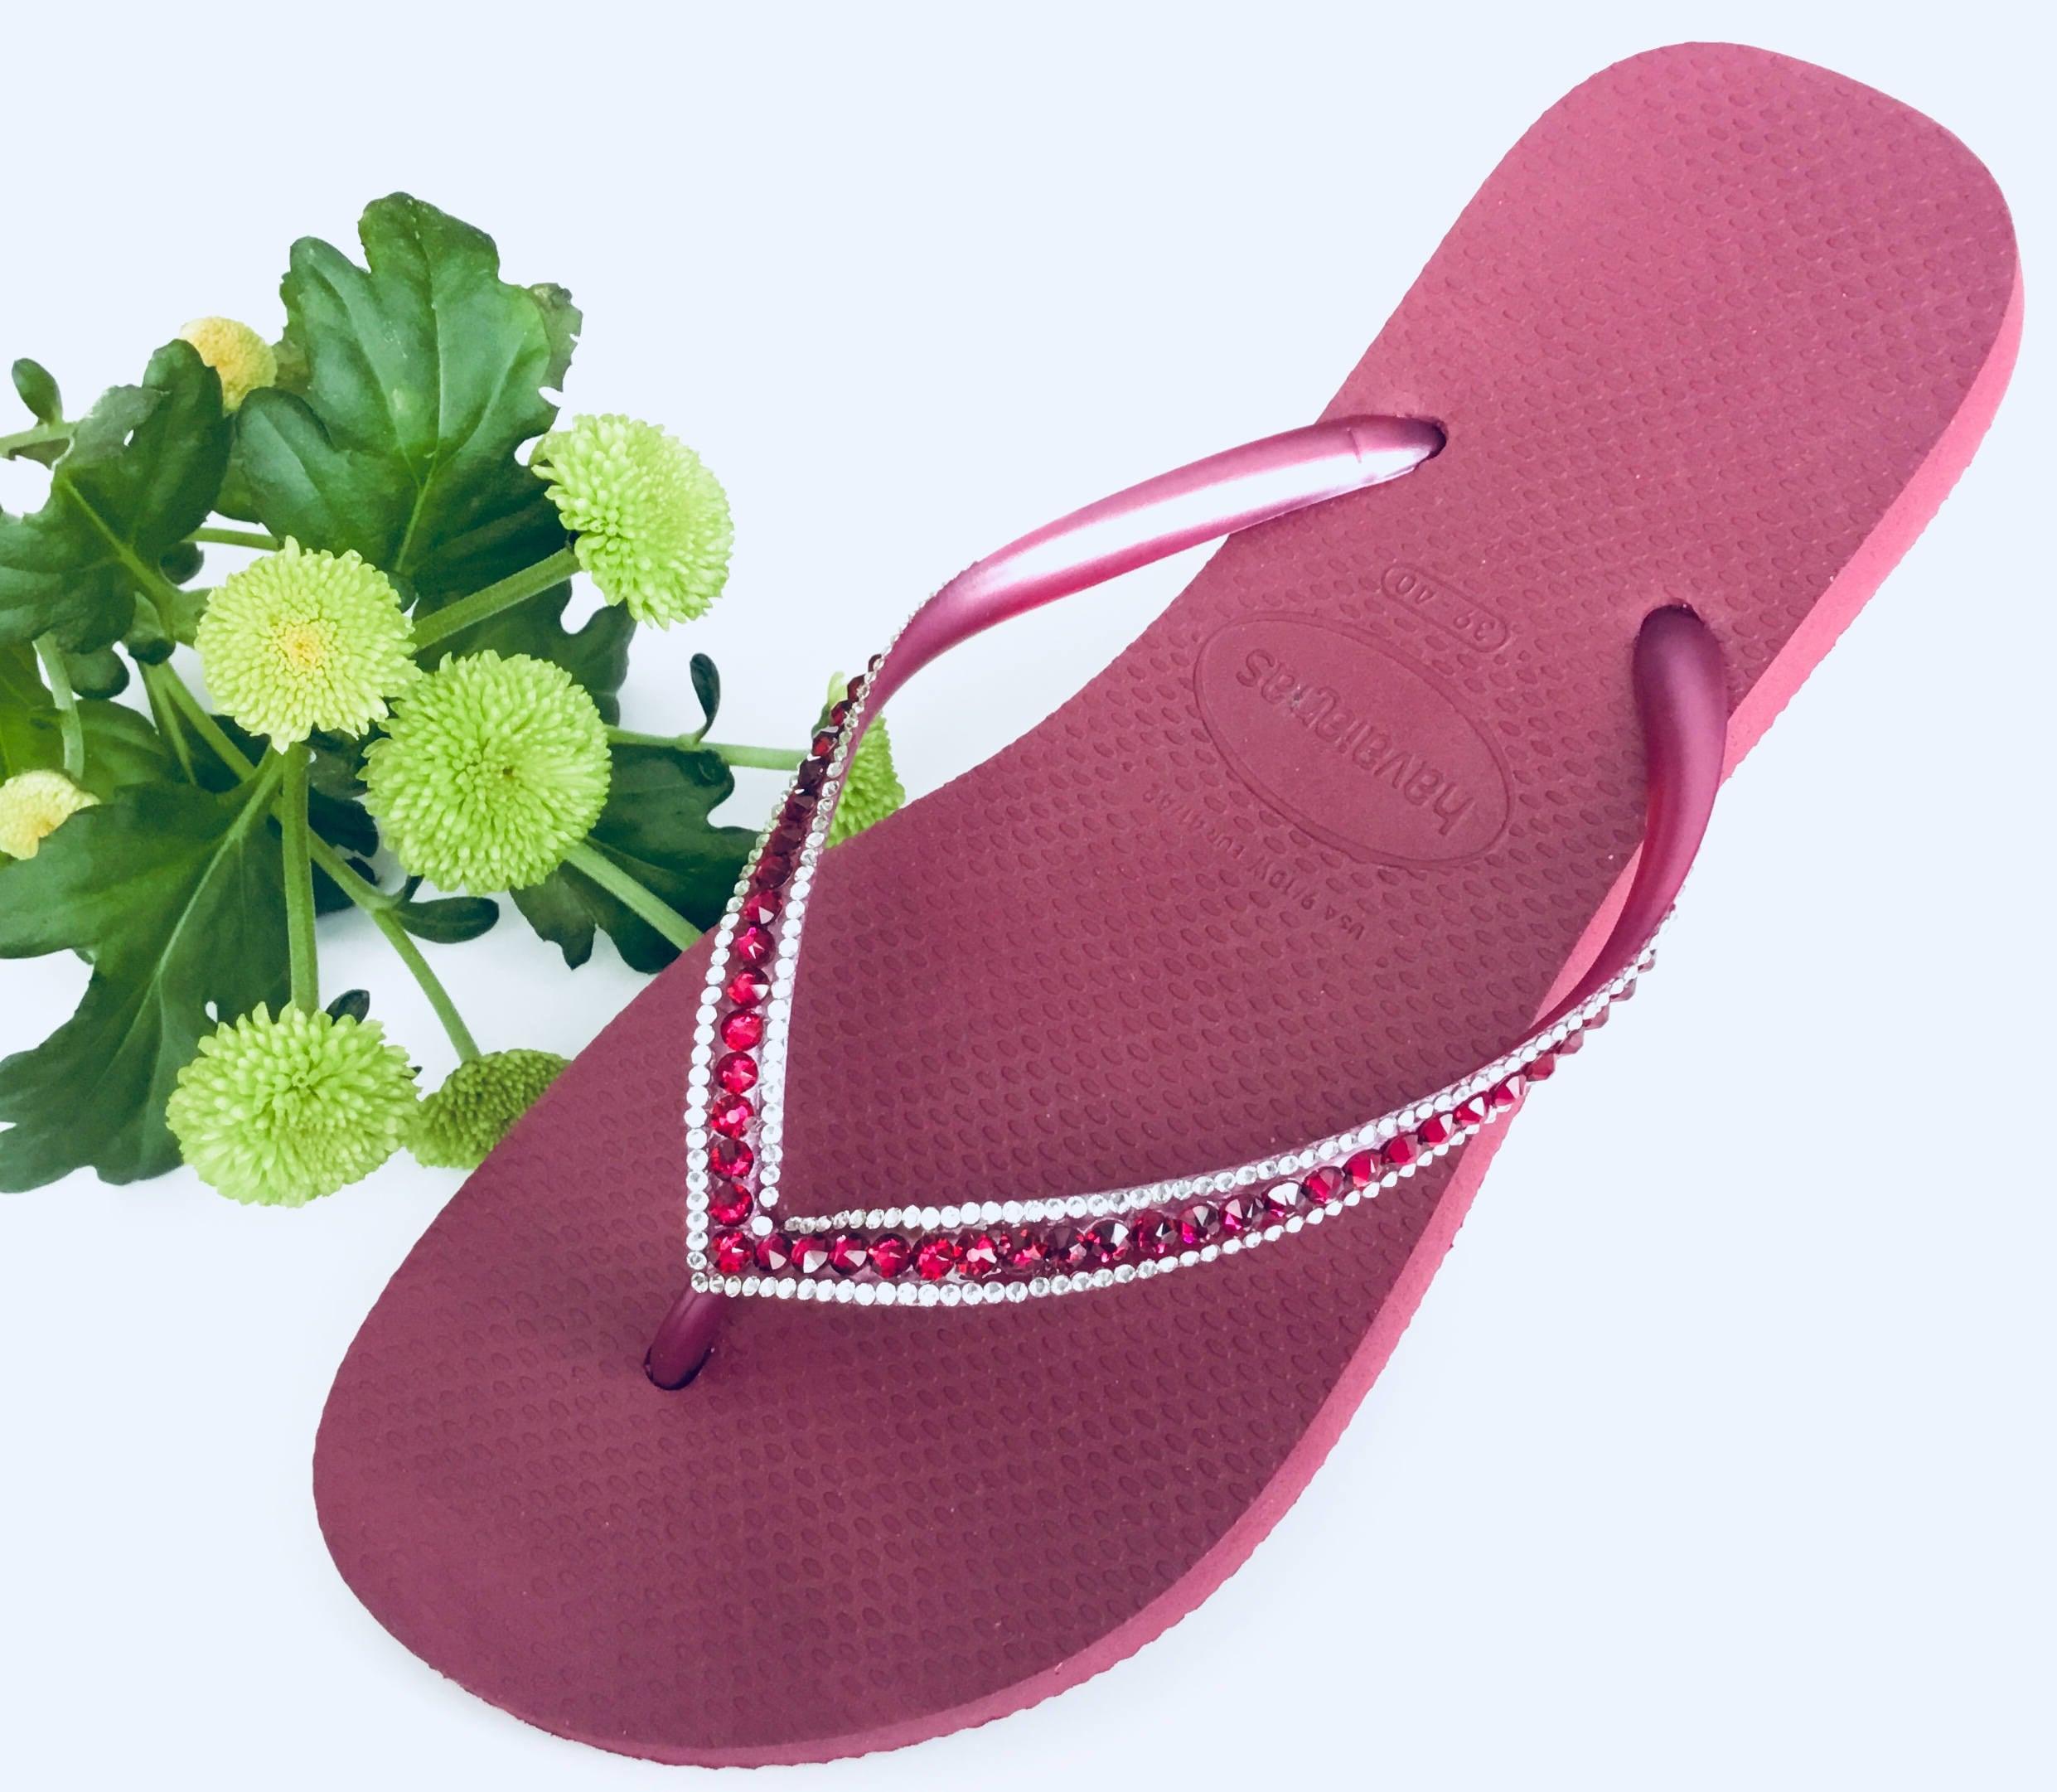 e153b42f30fb Pink Havaianas Slim Flip Flops Beet Ruby Red Raspberry Fuchsia